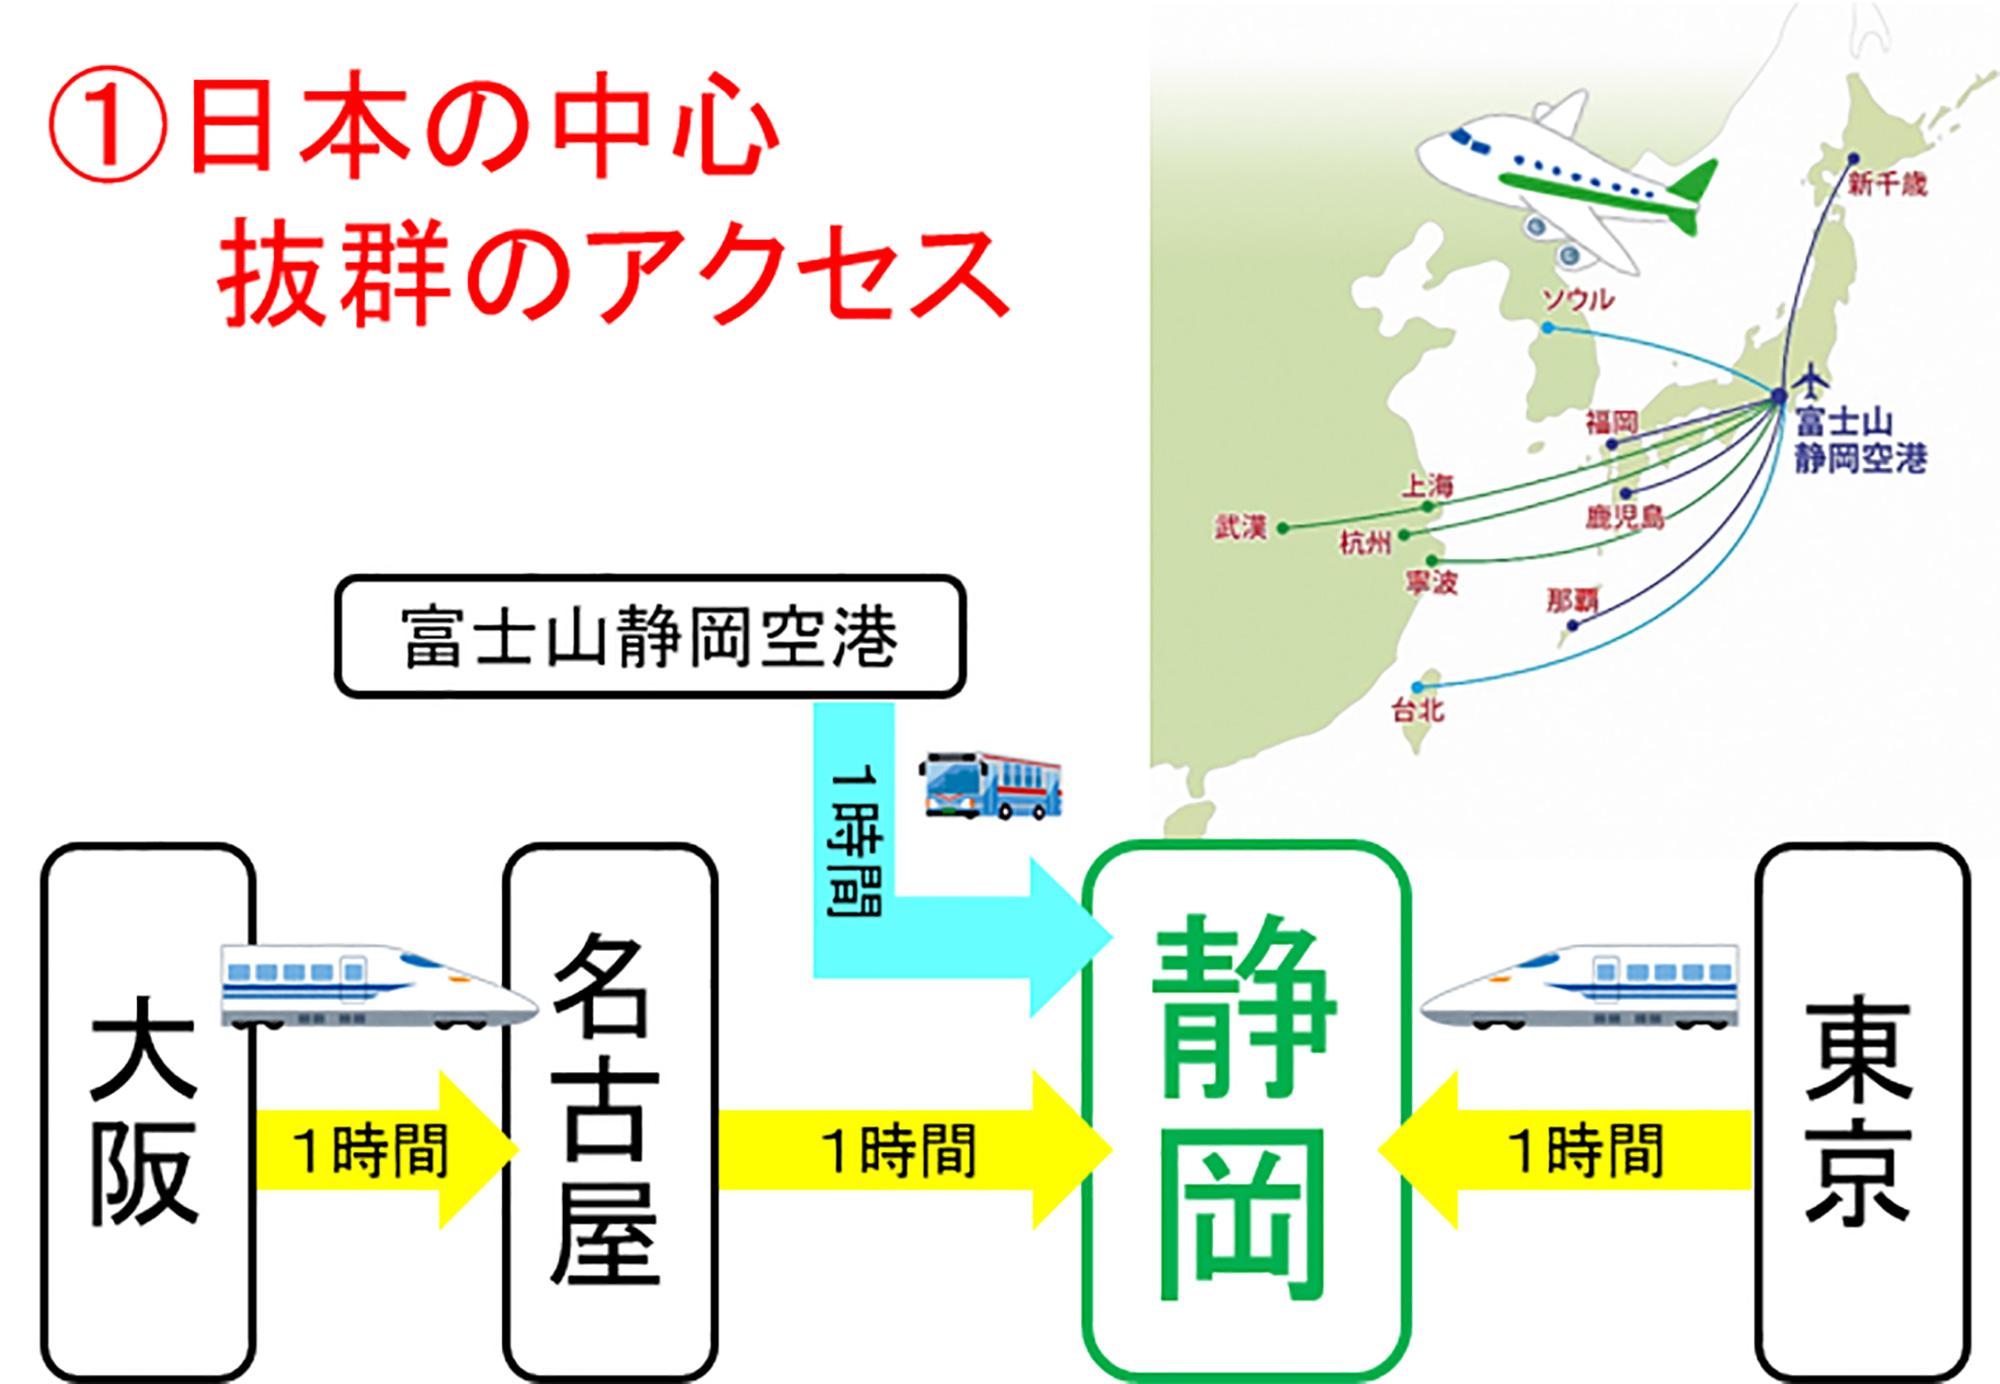 https://www.shizuoka-cb.com/wp-content/uploads/2021/03/アクセス.jpg